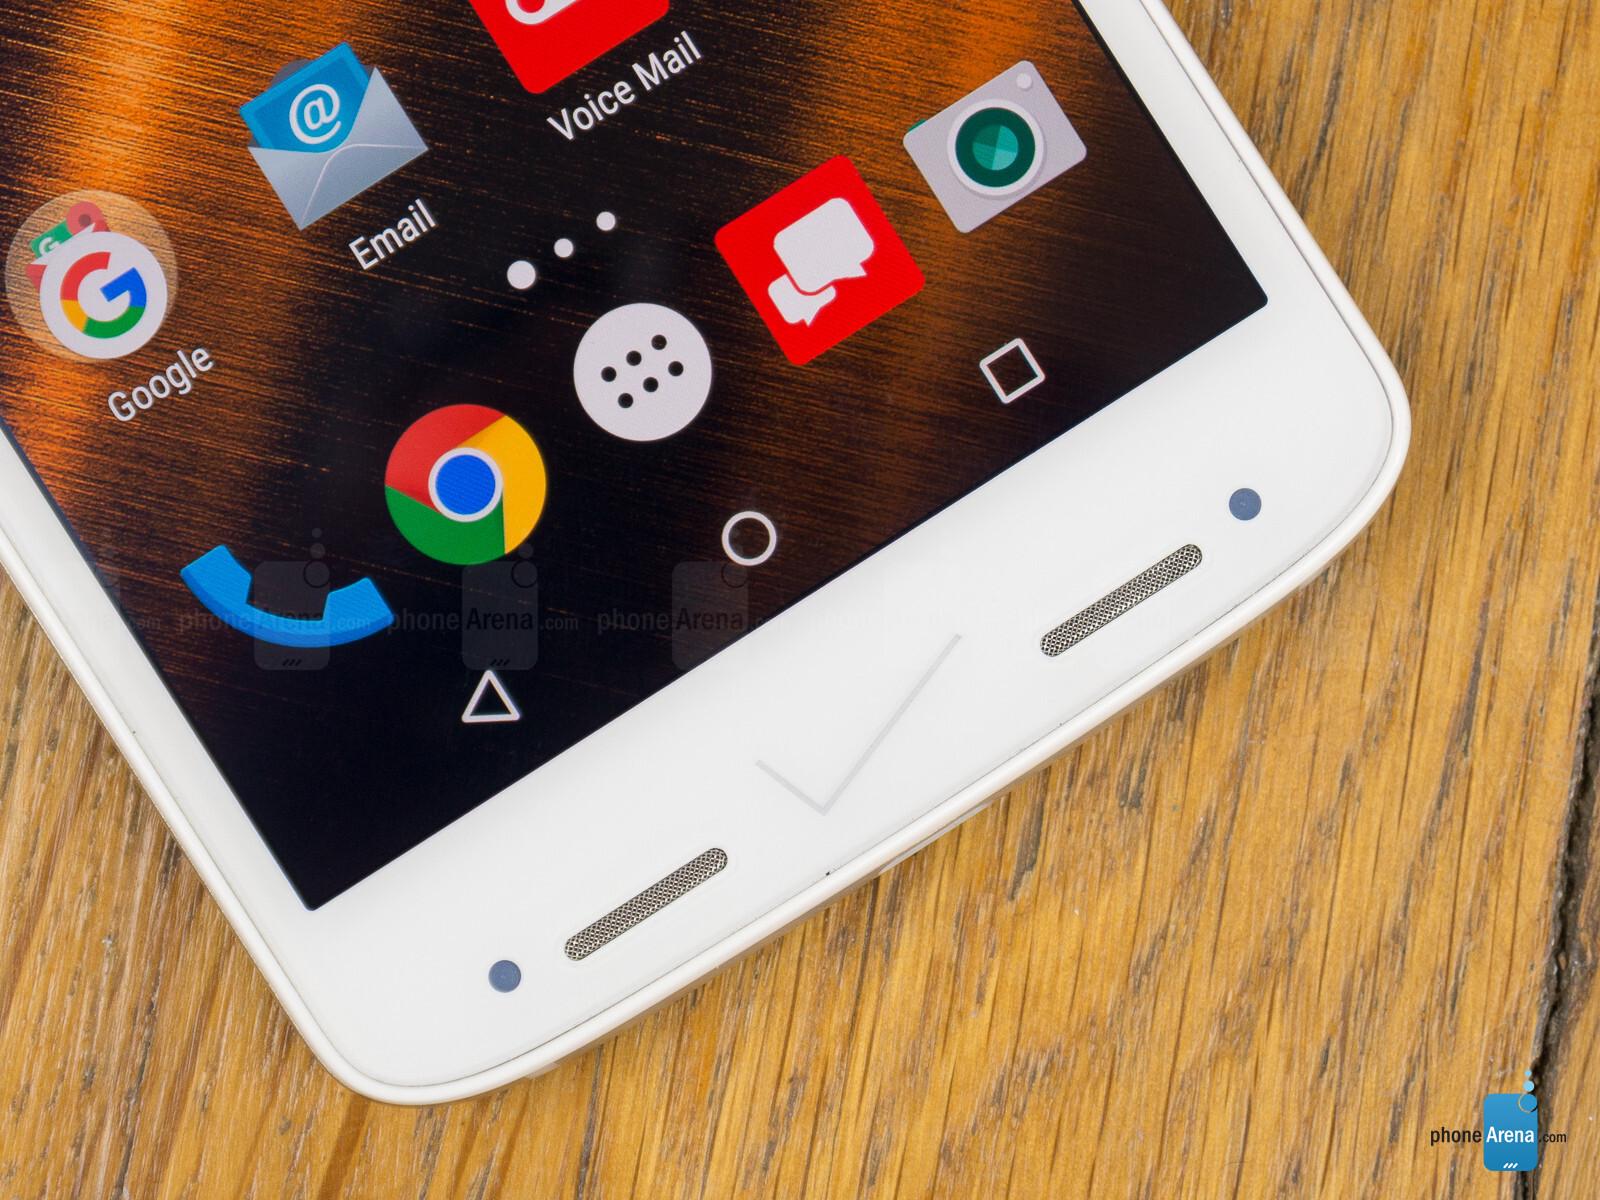 Motorola DROID Turbo 2 Review - PhoneArena